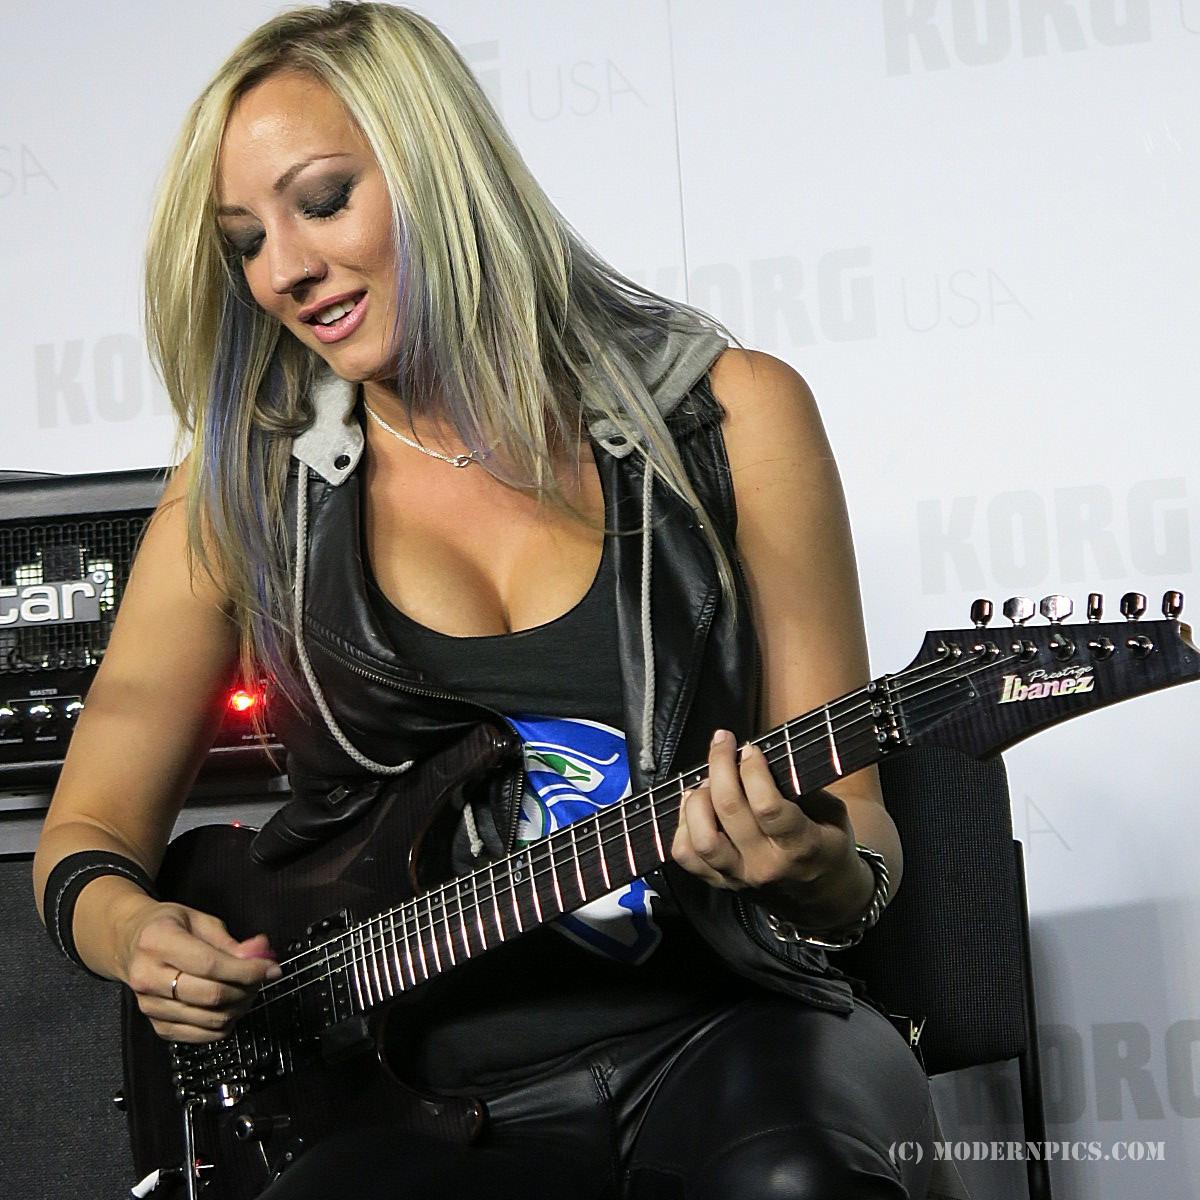 Audio & music gear image: Nita Strauss Korg USA MP466 (c) ModernPics.JPG (#1034990) - Audiofanzine